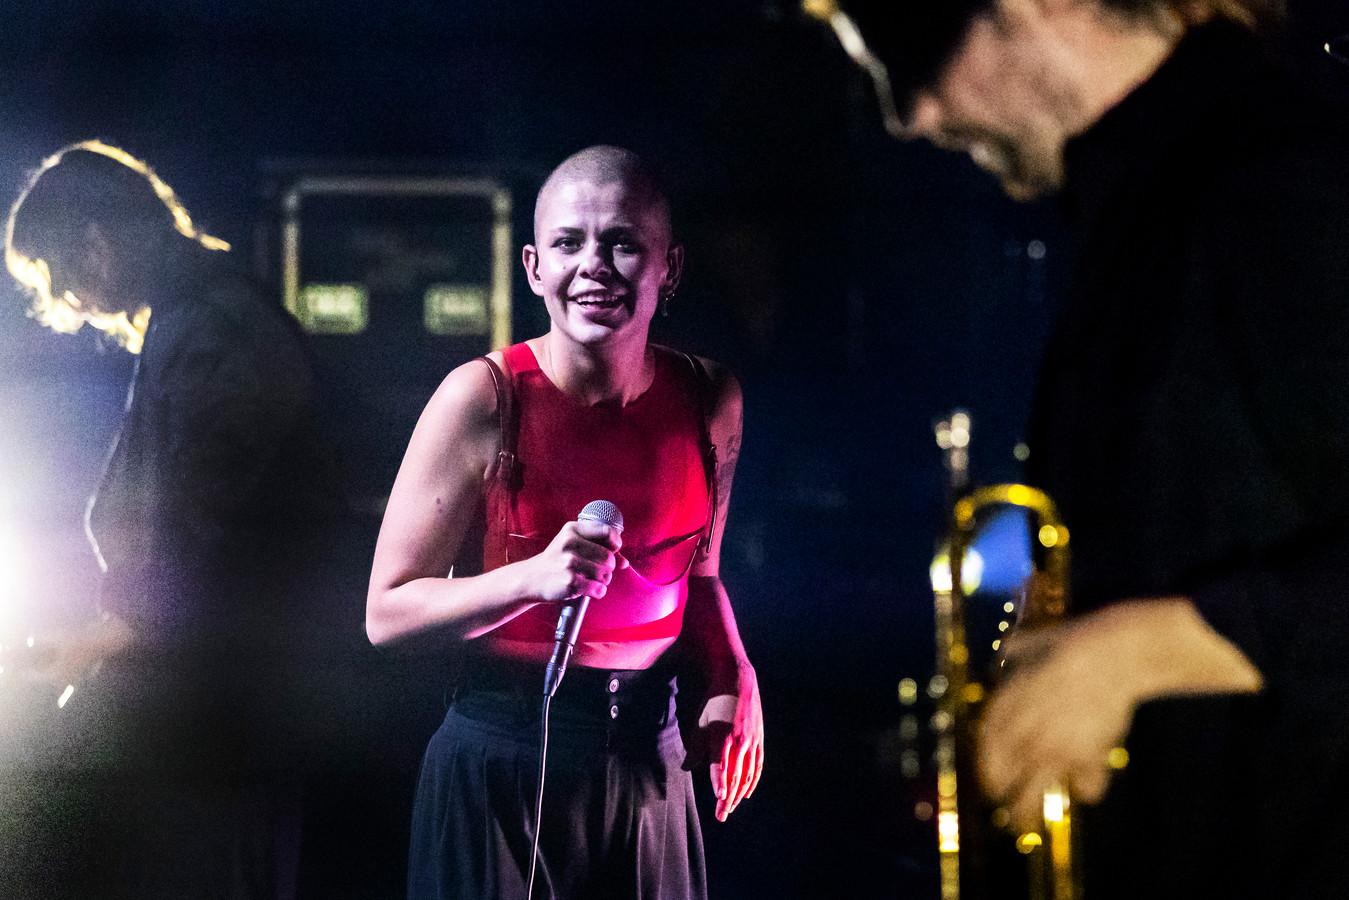 Sharon Kovacs in TivoliVredenburg.